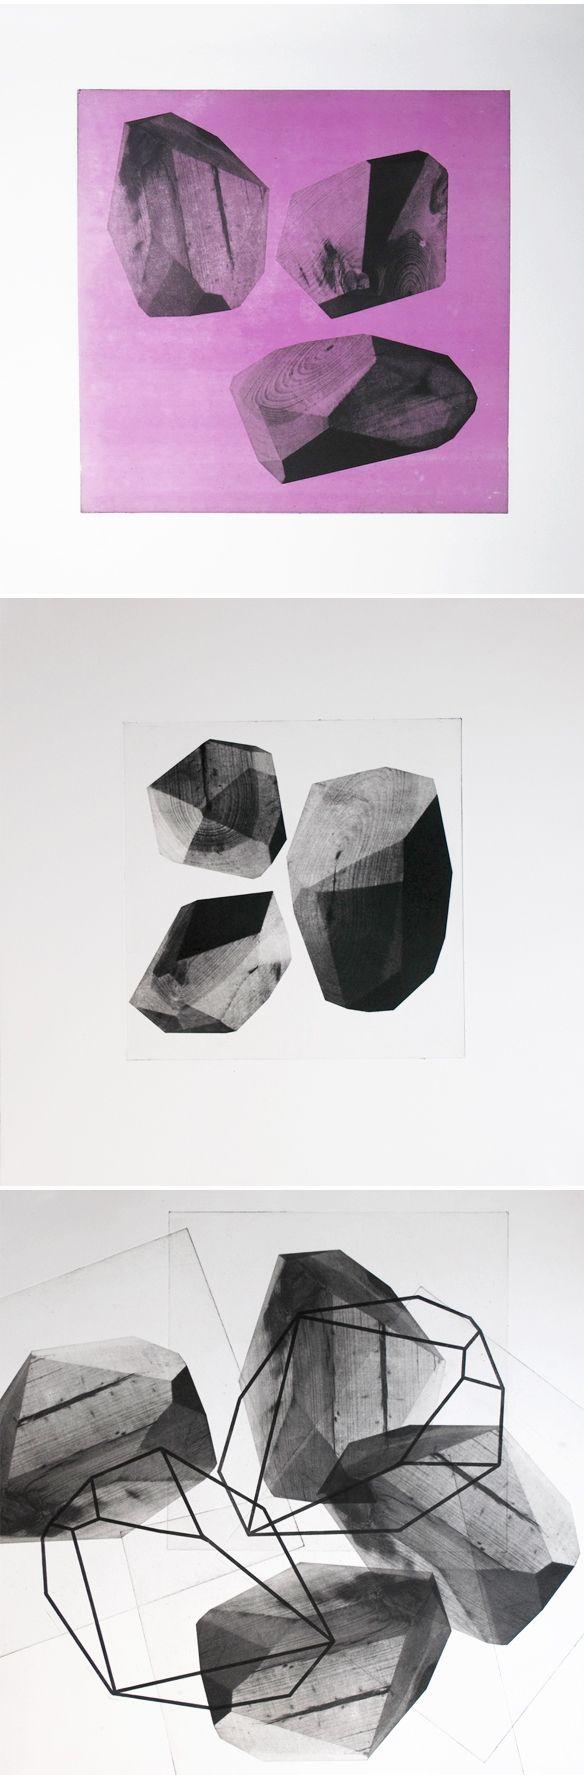 hailey walsh - photopolymer prints